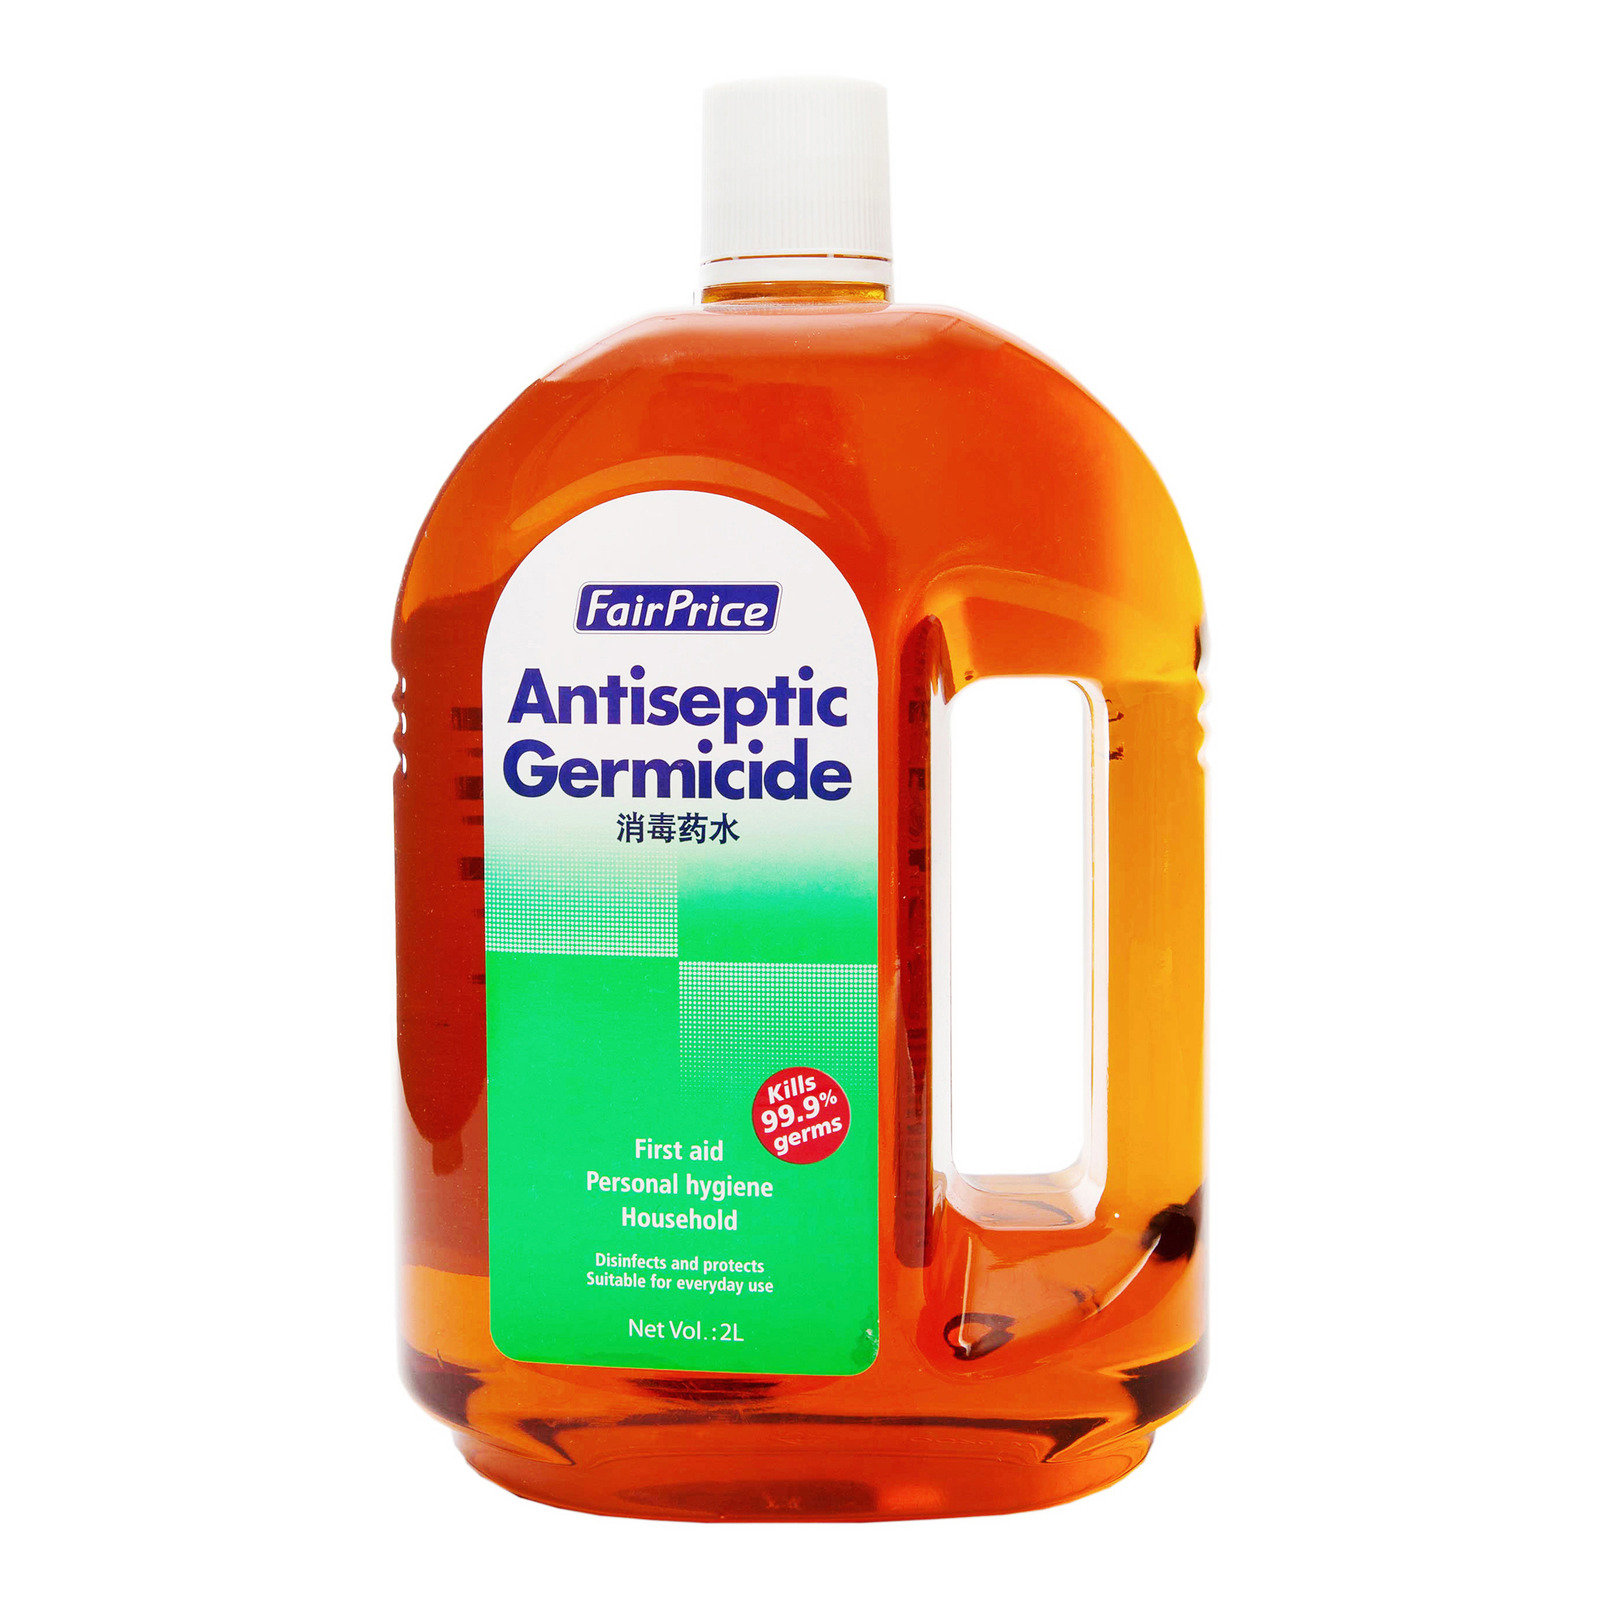 FairPrice Antiseptic Germicide